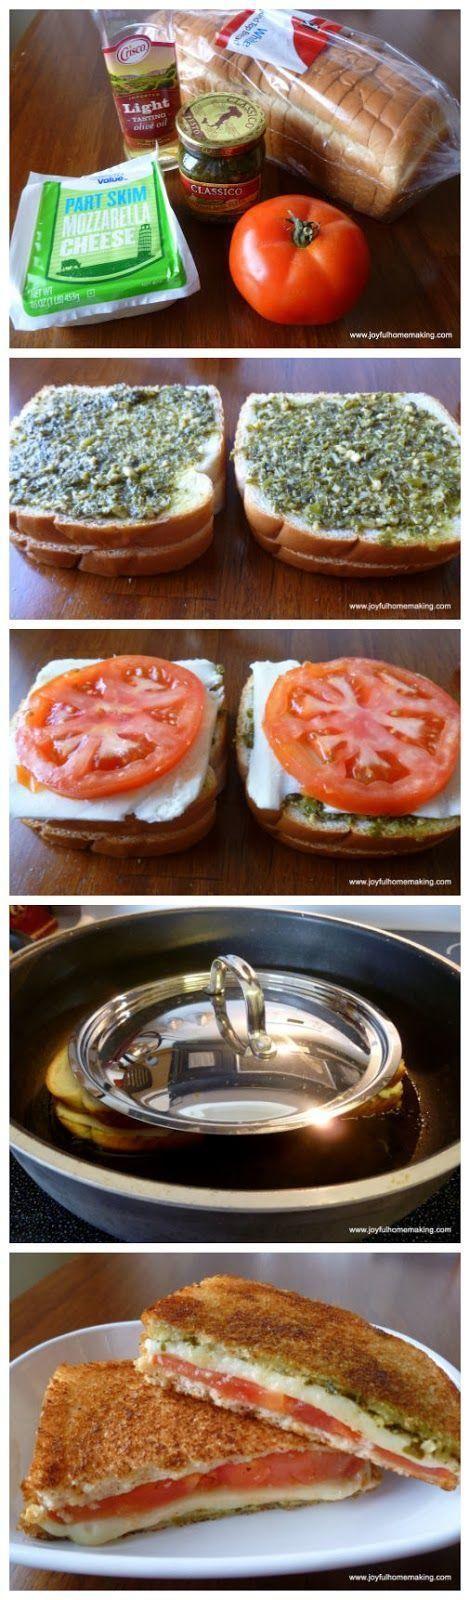 Grilled Cheese with Tomato and Pesto - Joybx